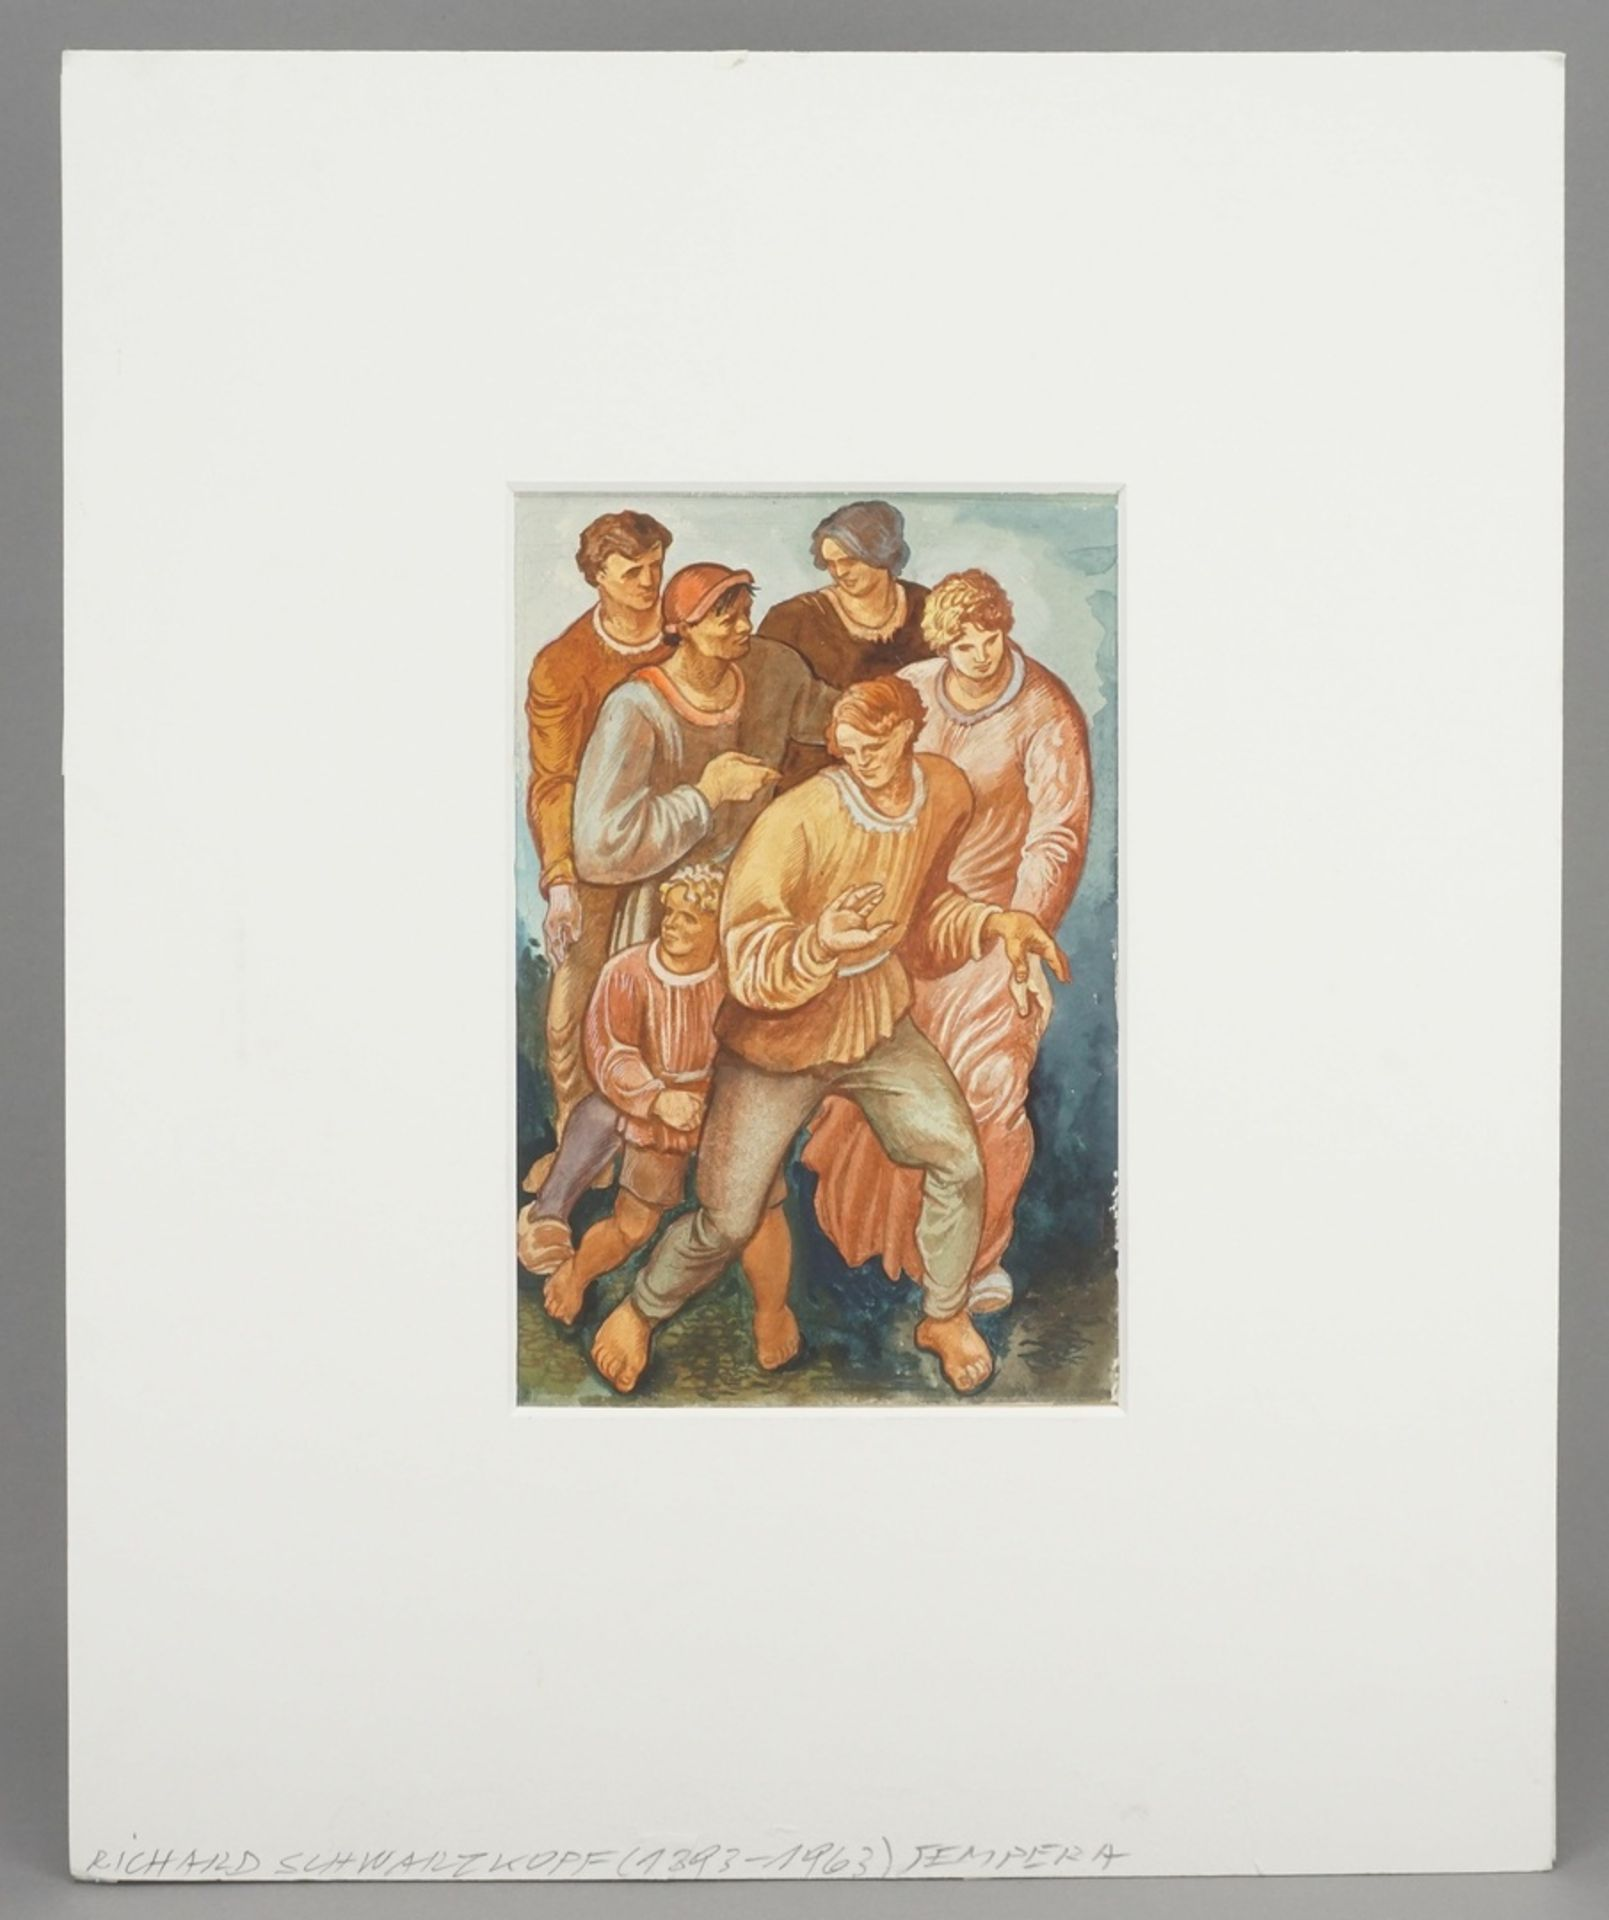 Richard Schwarzkopf, Figurengruppe - Bild 2 aus 4